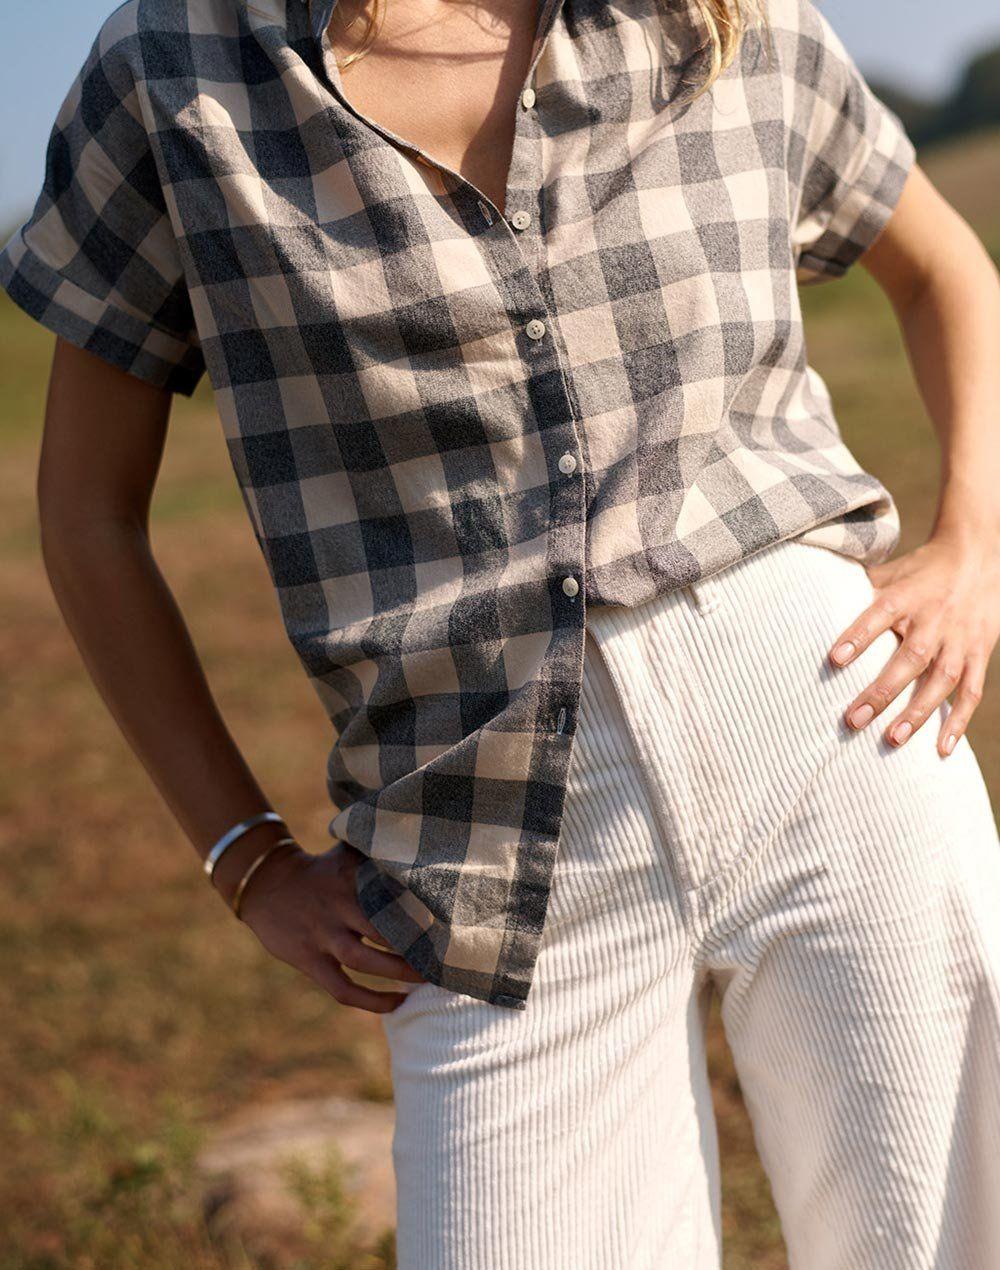 366983adc8d madewell central shirt worn with emmett wide-leg crop pants.